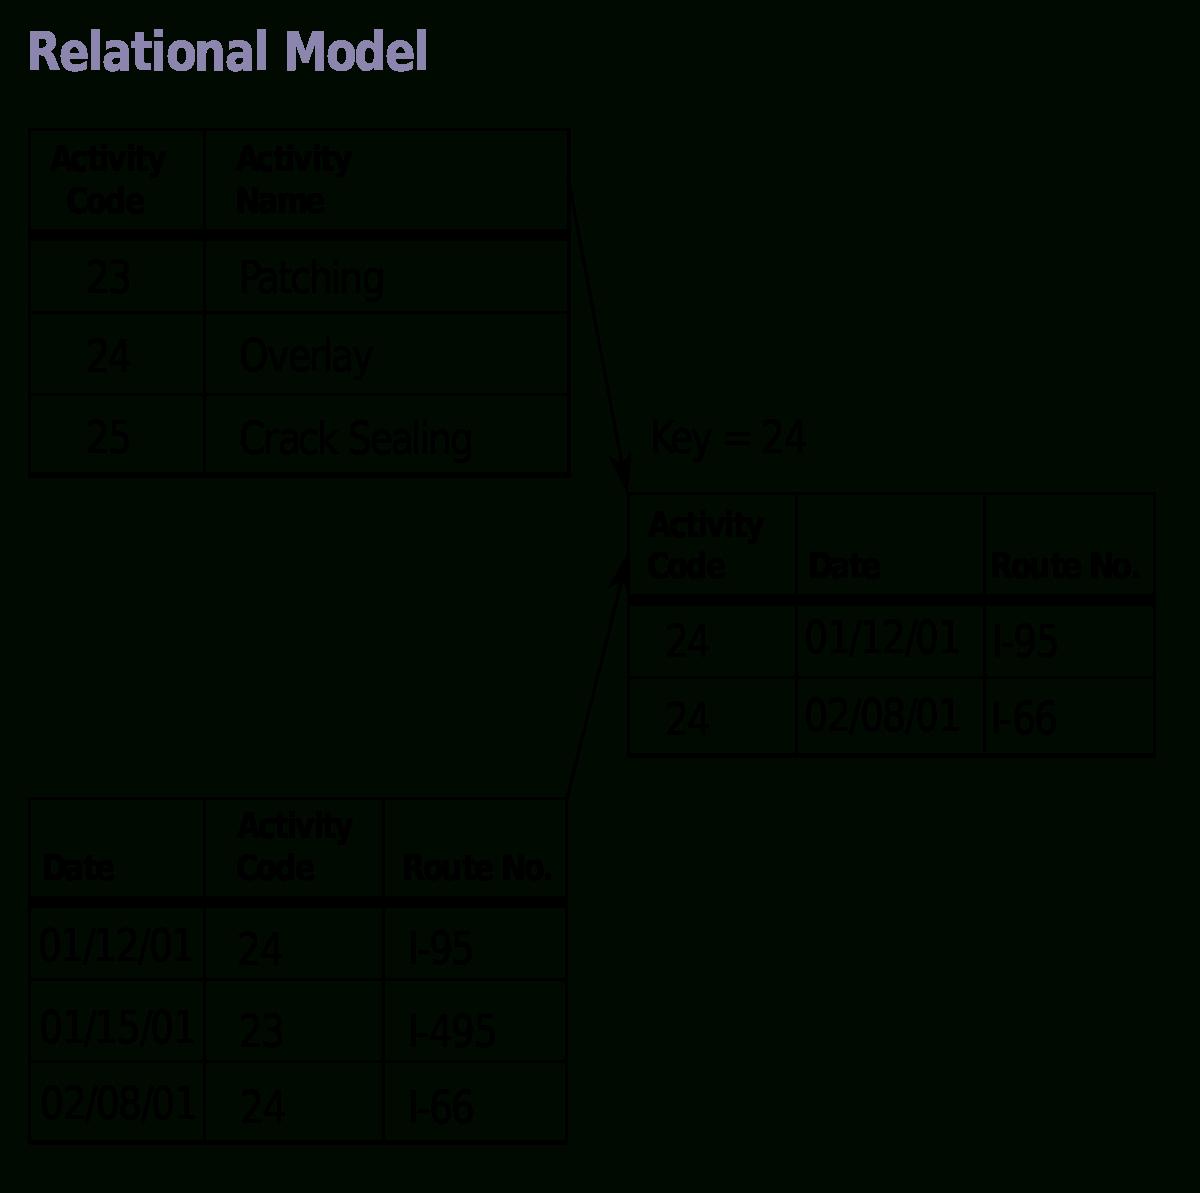 Relational Database Model Diagram